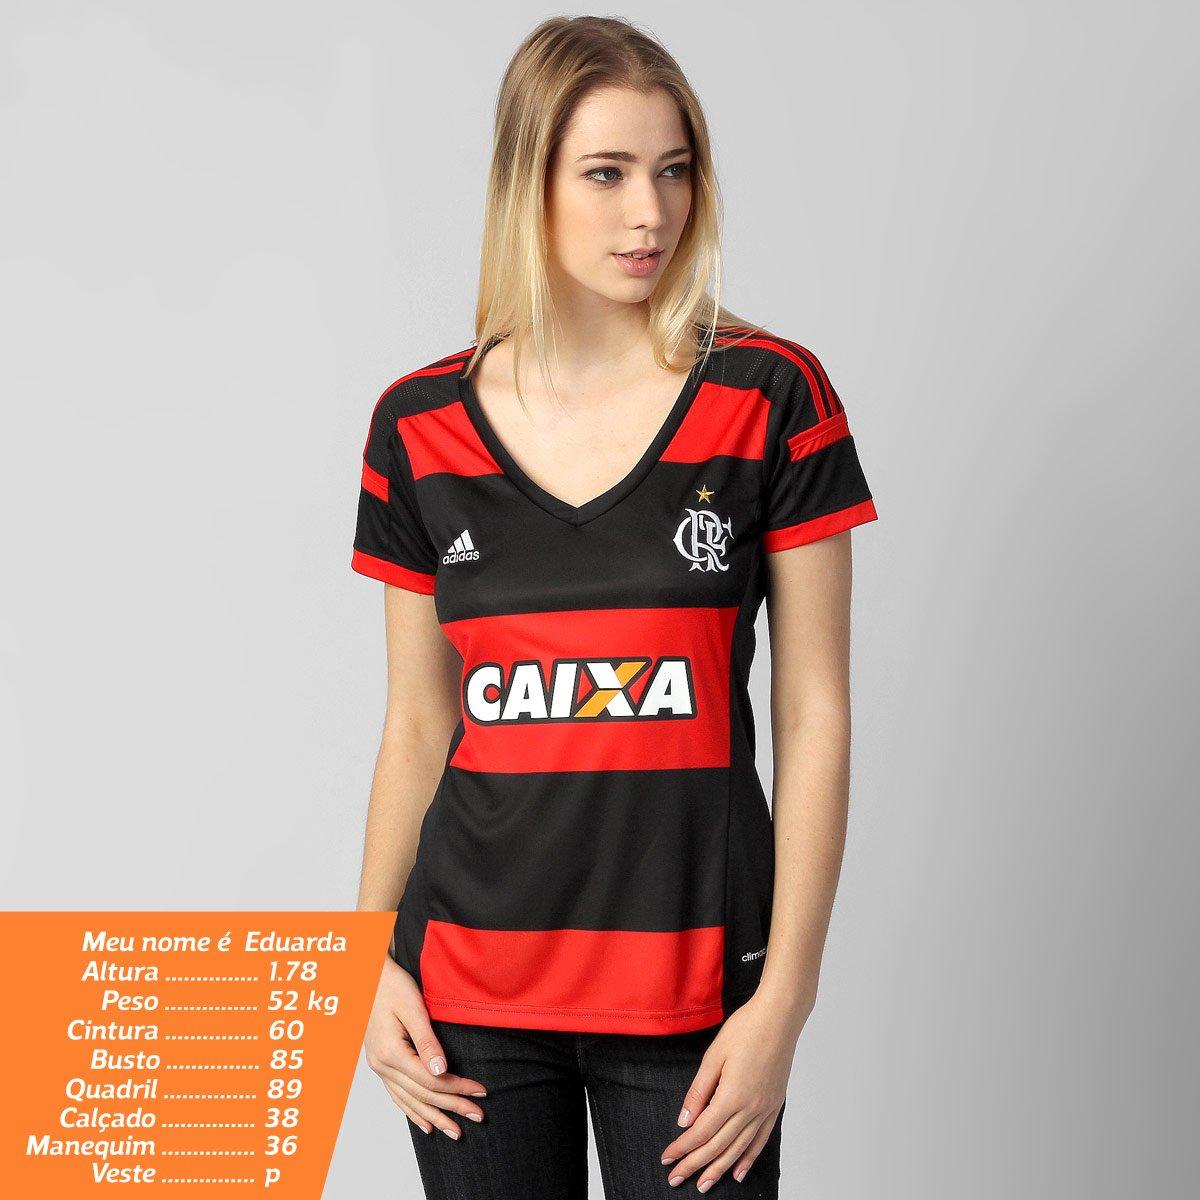 Camisa Flamengo I 14 15 s nº Torcedor Adidas Feminina - Compre Agora ... b69361b7b97ee